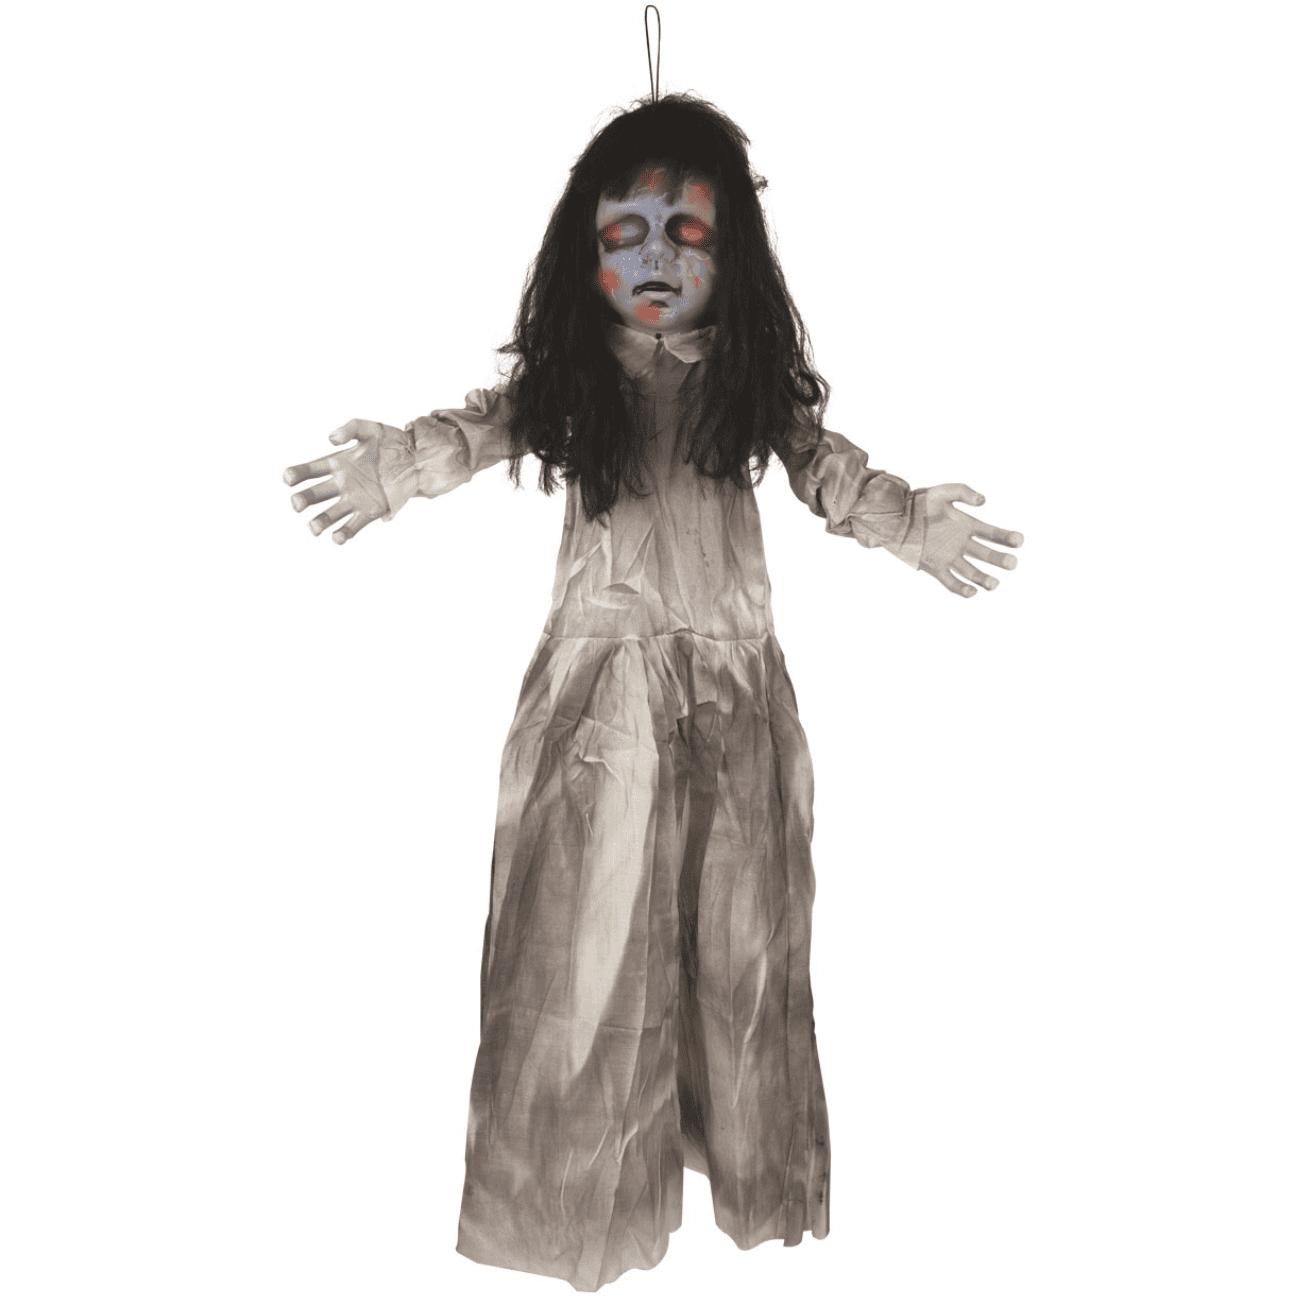 Gruseliges Puppenmädchen